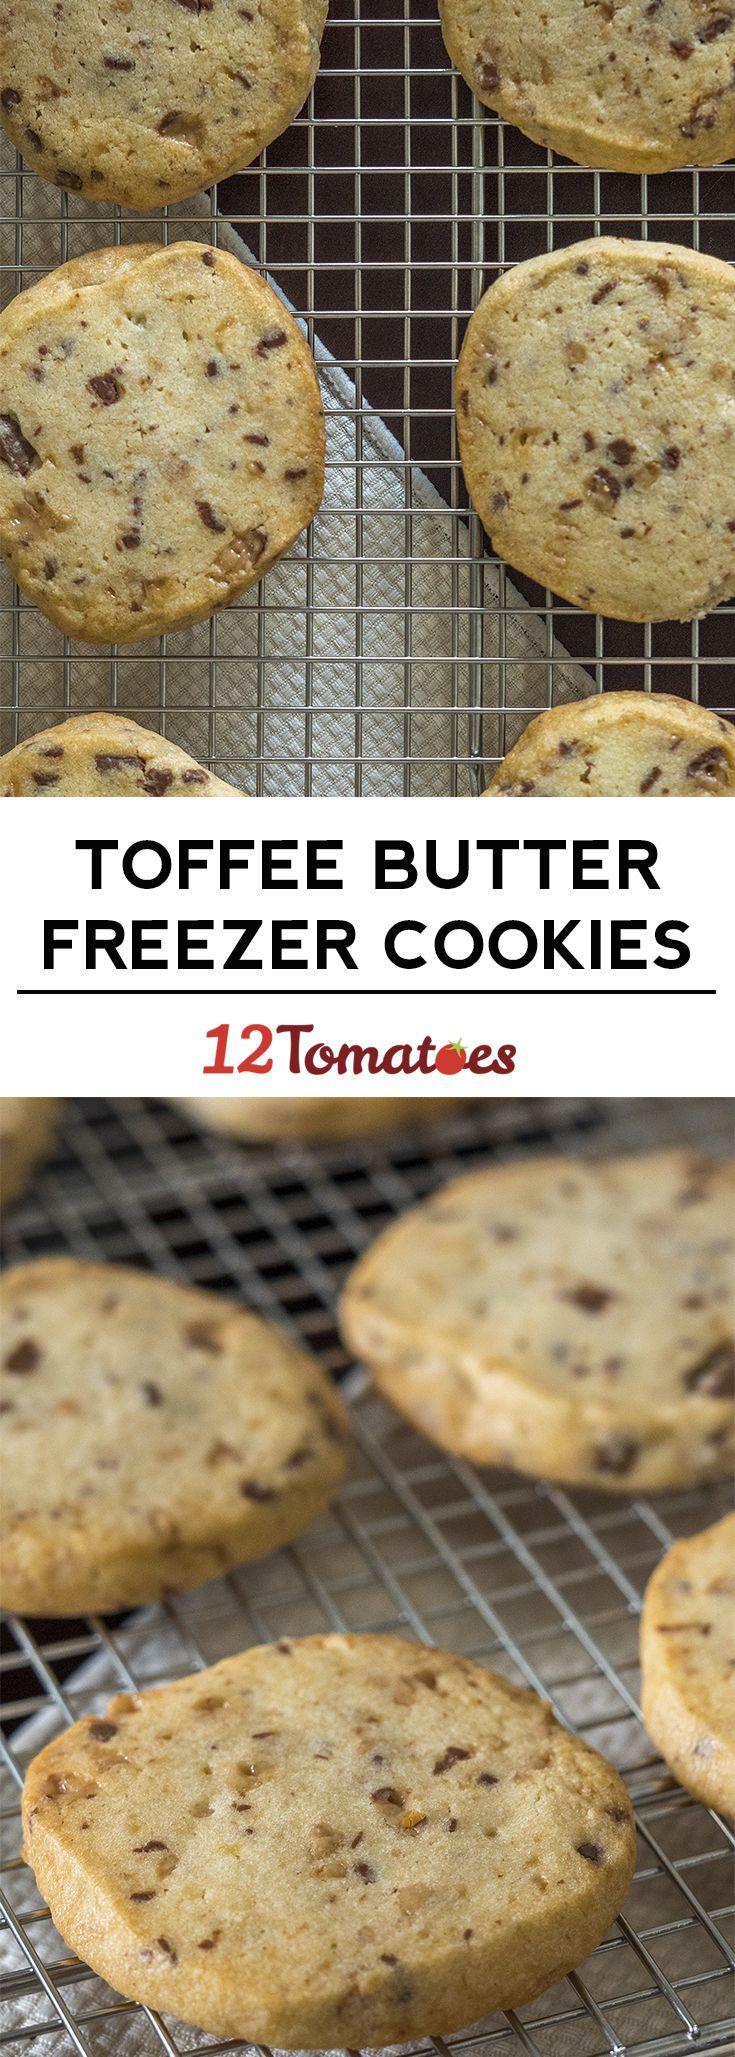 Toffee Butter Freezer Cookies